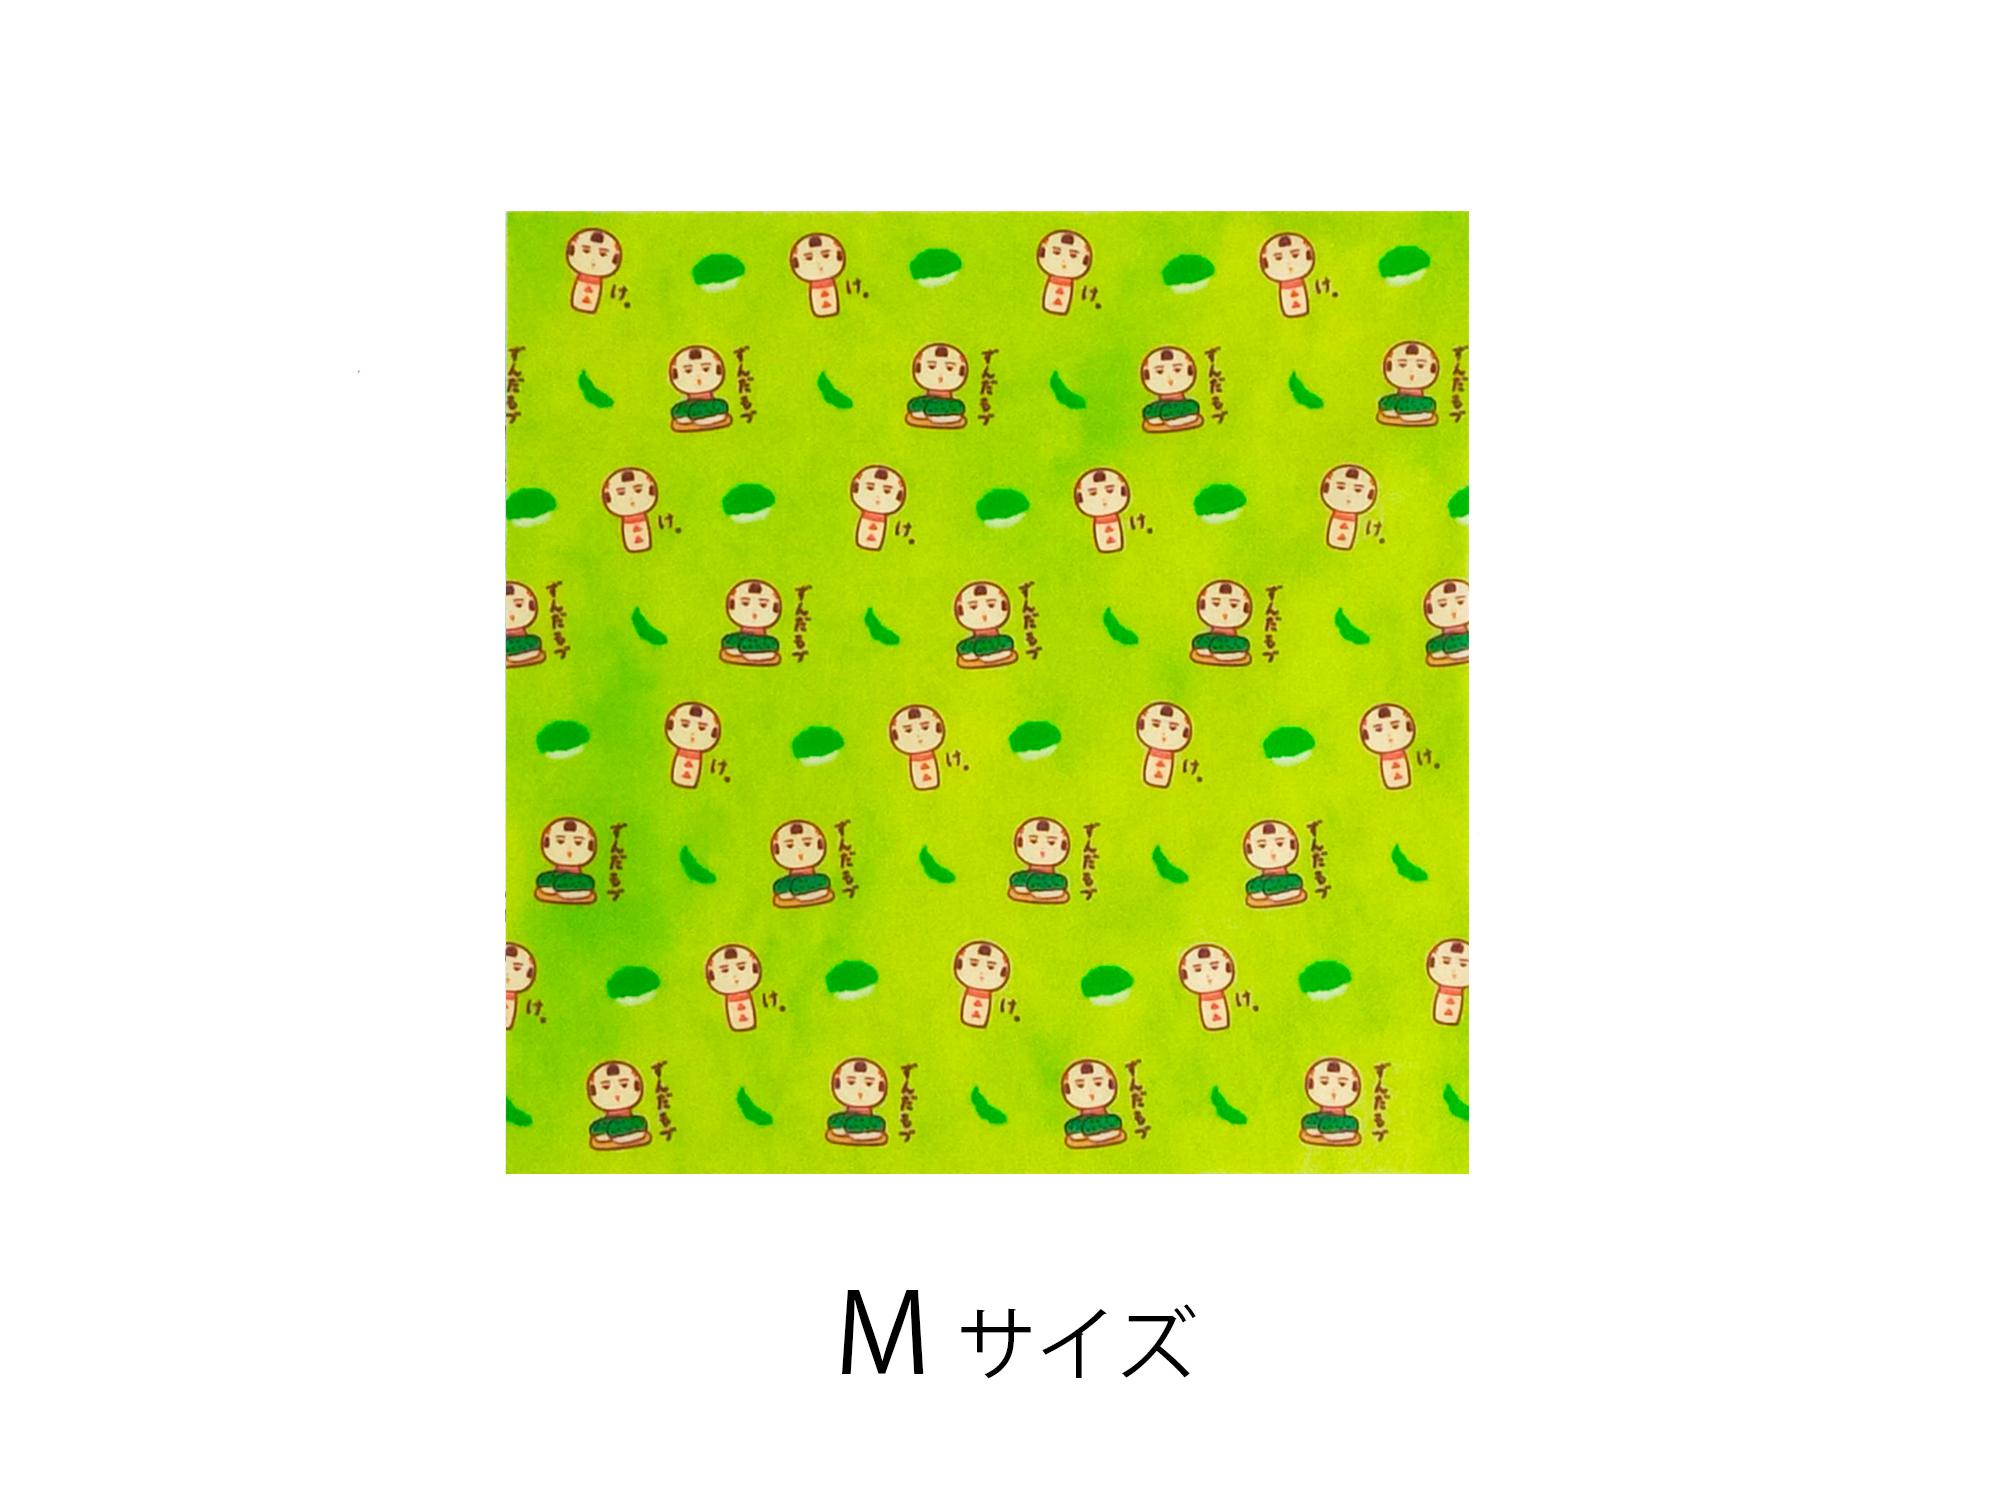 tsu tsu mi / M 27cm / 仙台弁こけし ずんだもづ